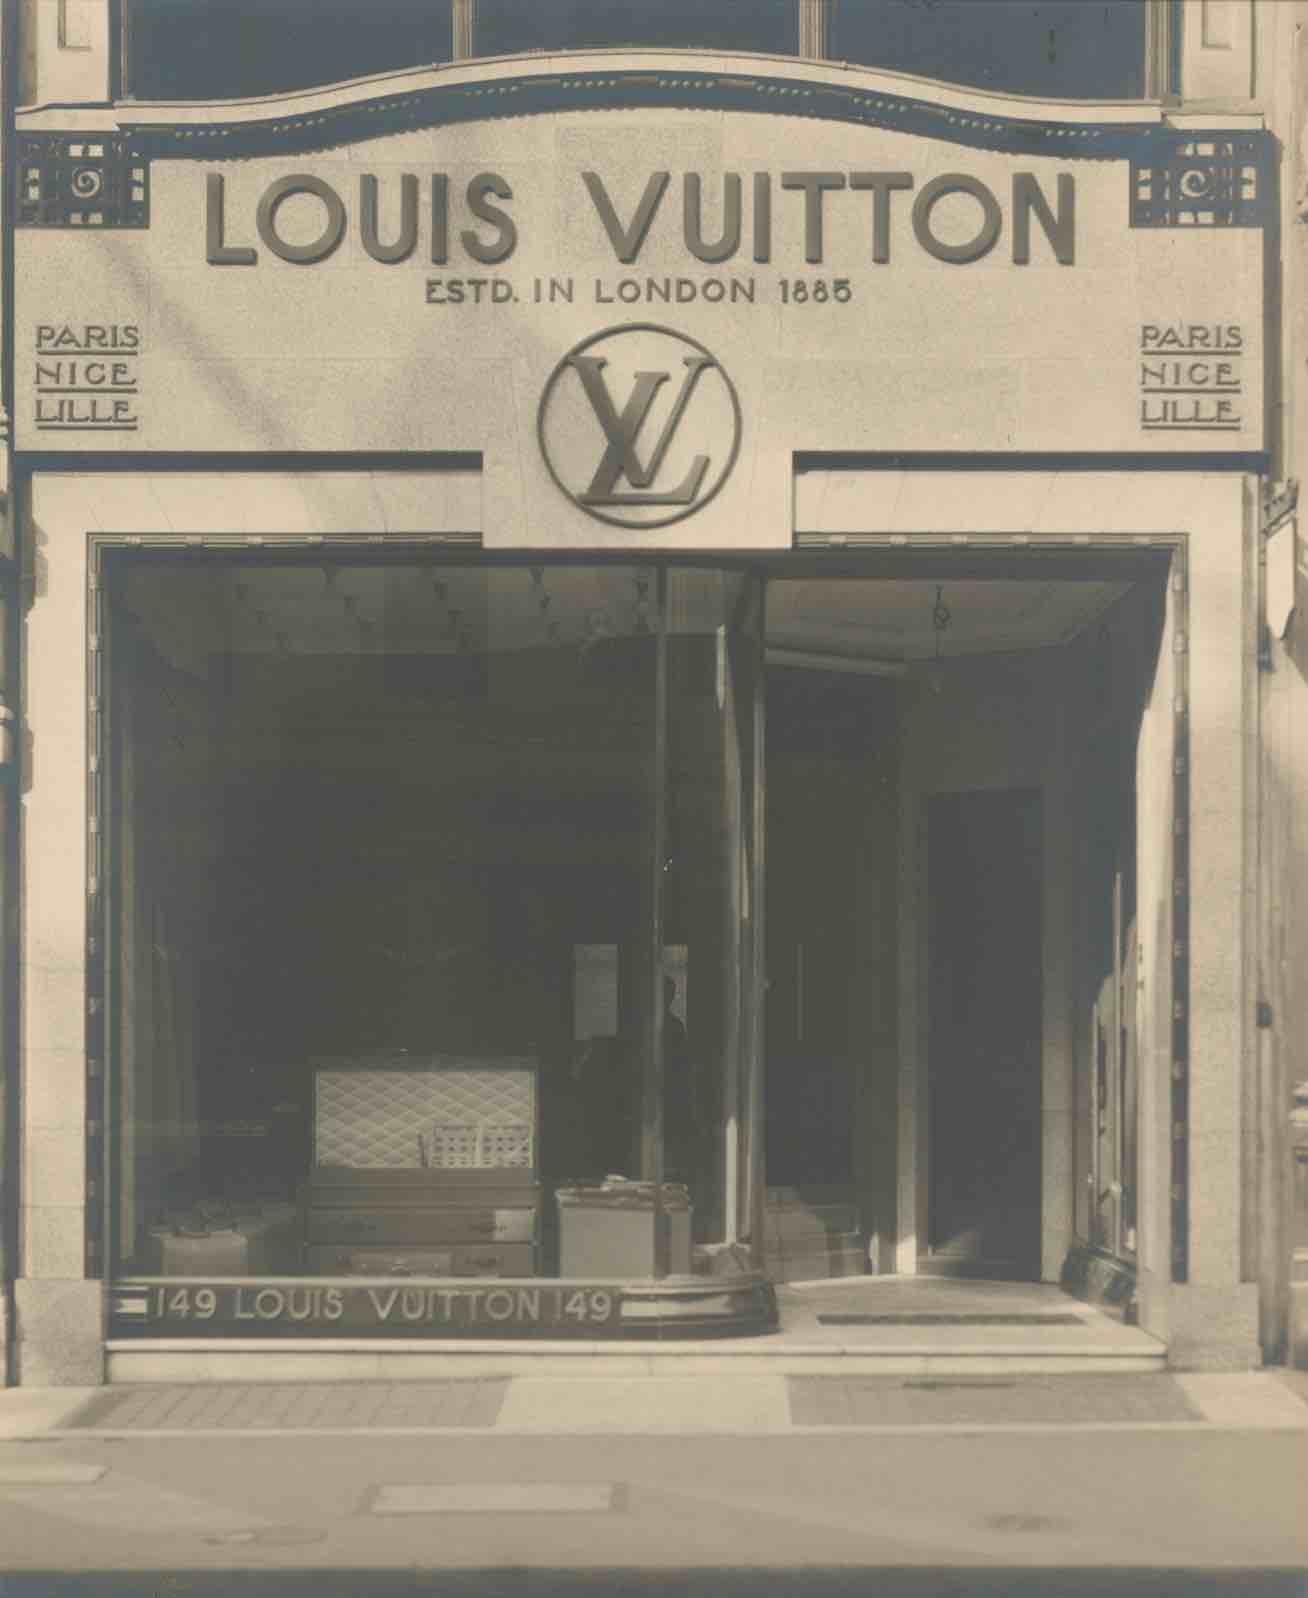 (Butik pertama Louis Vuitton di Paris yang berlokasi di 4 rue Neuve-des-Capucines, Place Vendôme)